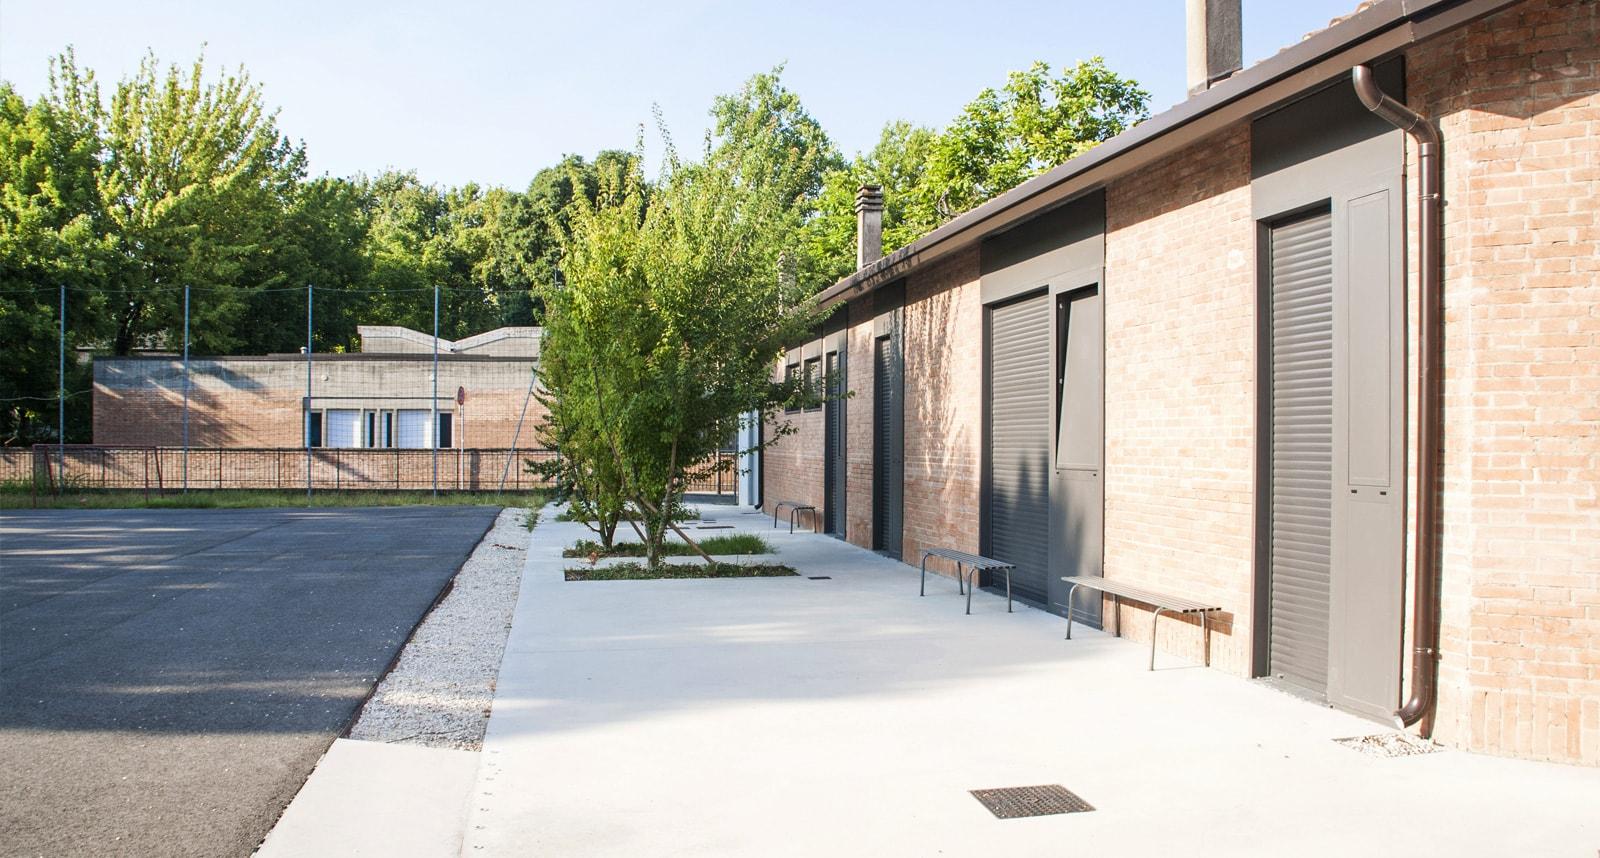 parrocchia-immacolata-project-external-01